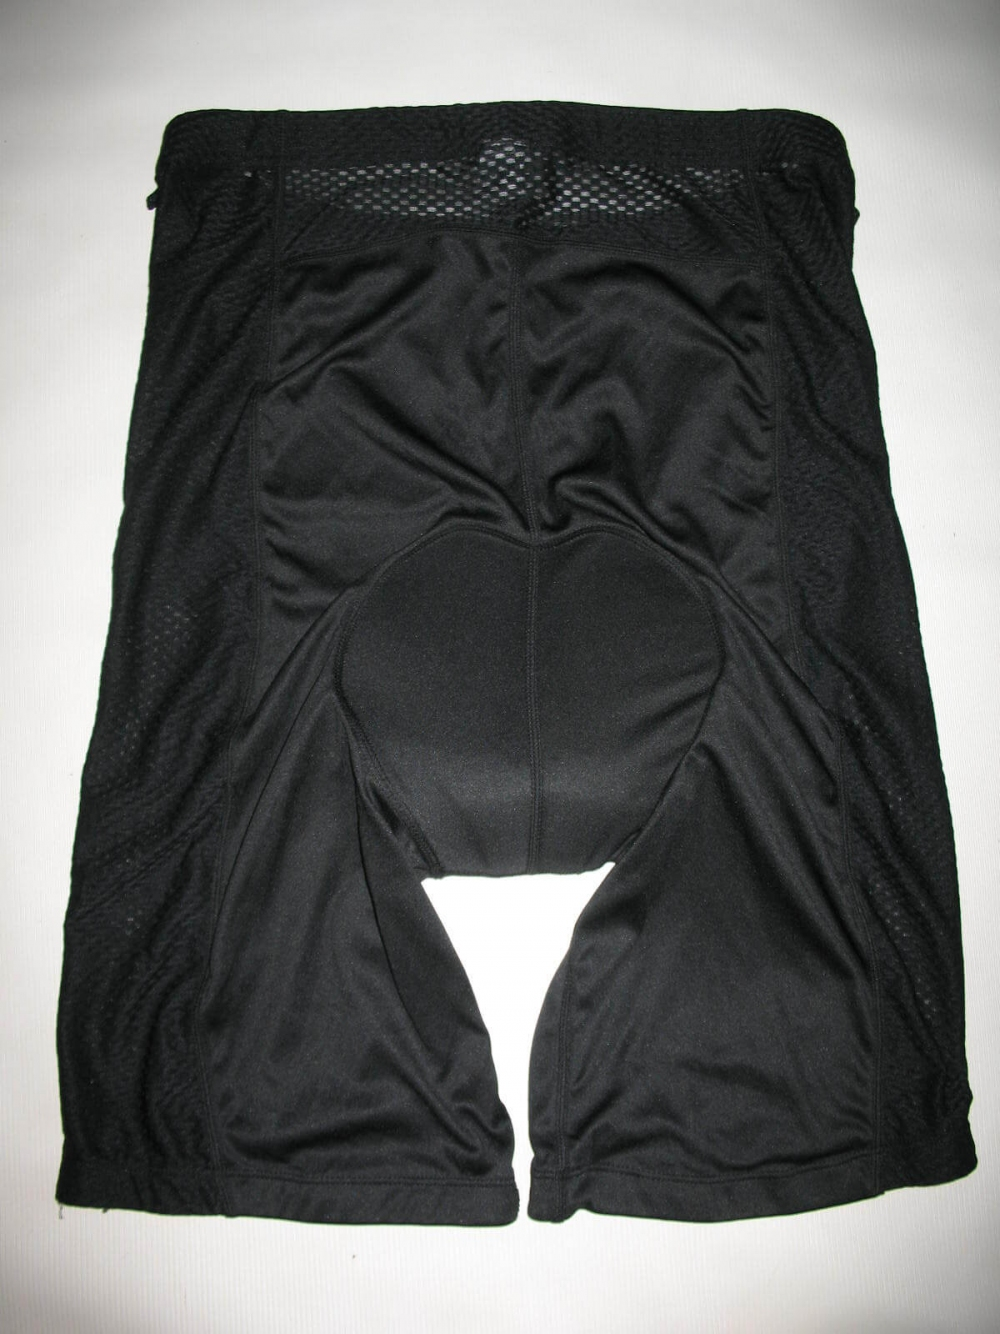 Велошорты CRAFT underwear cycling shorts (размер XL) - 1